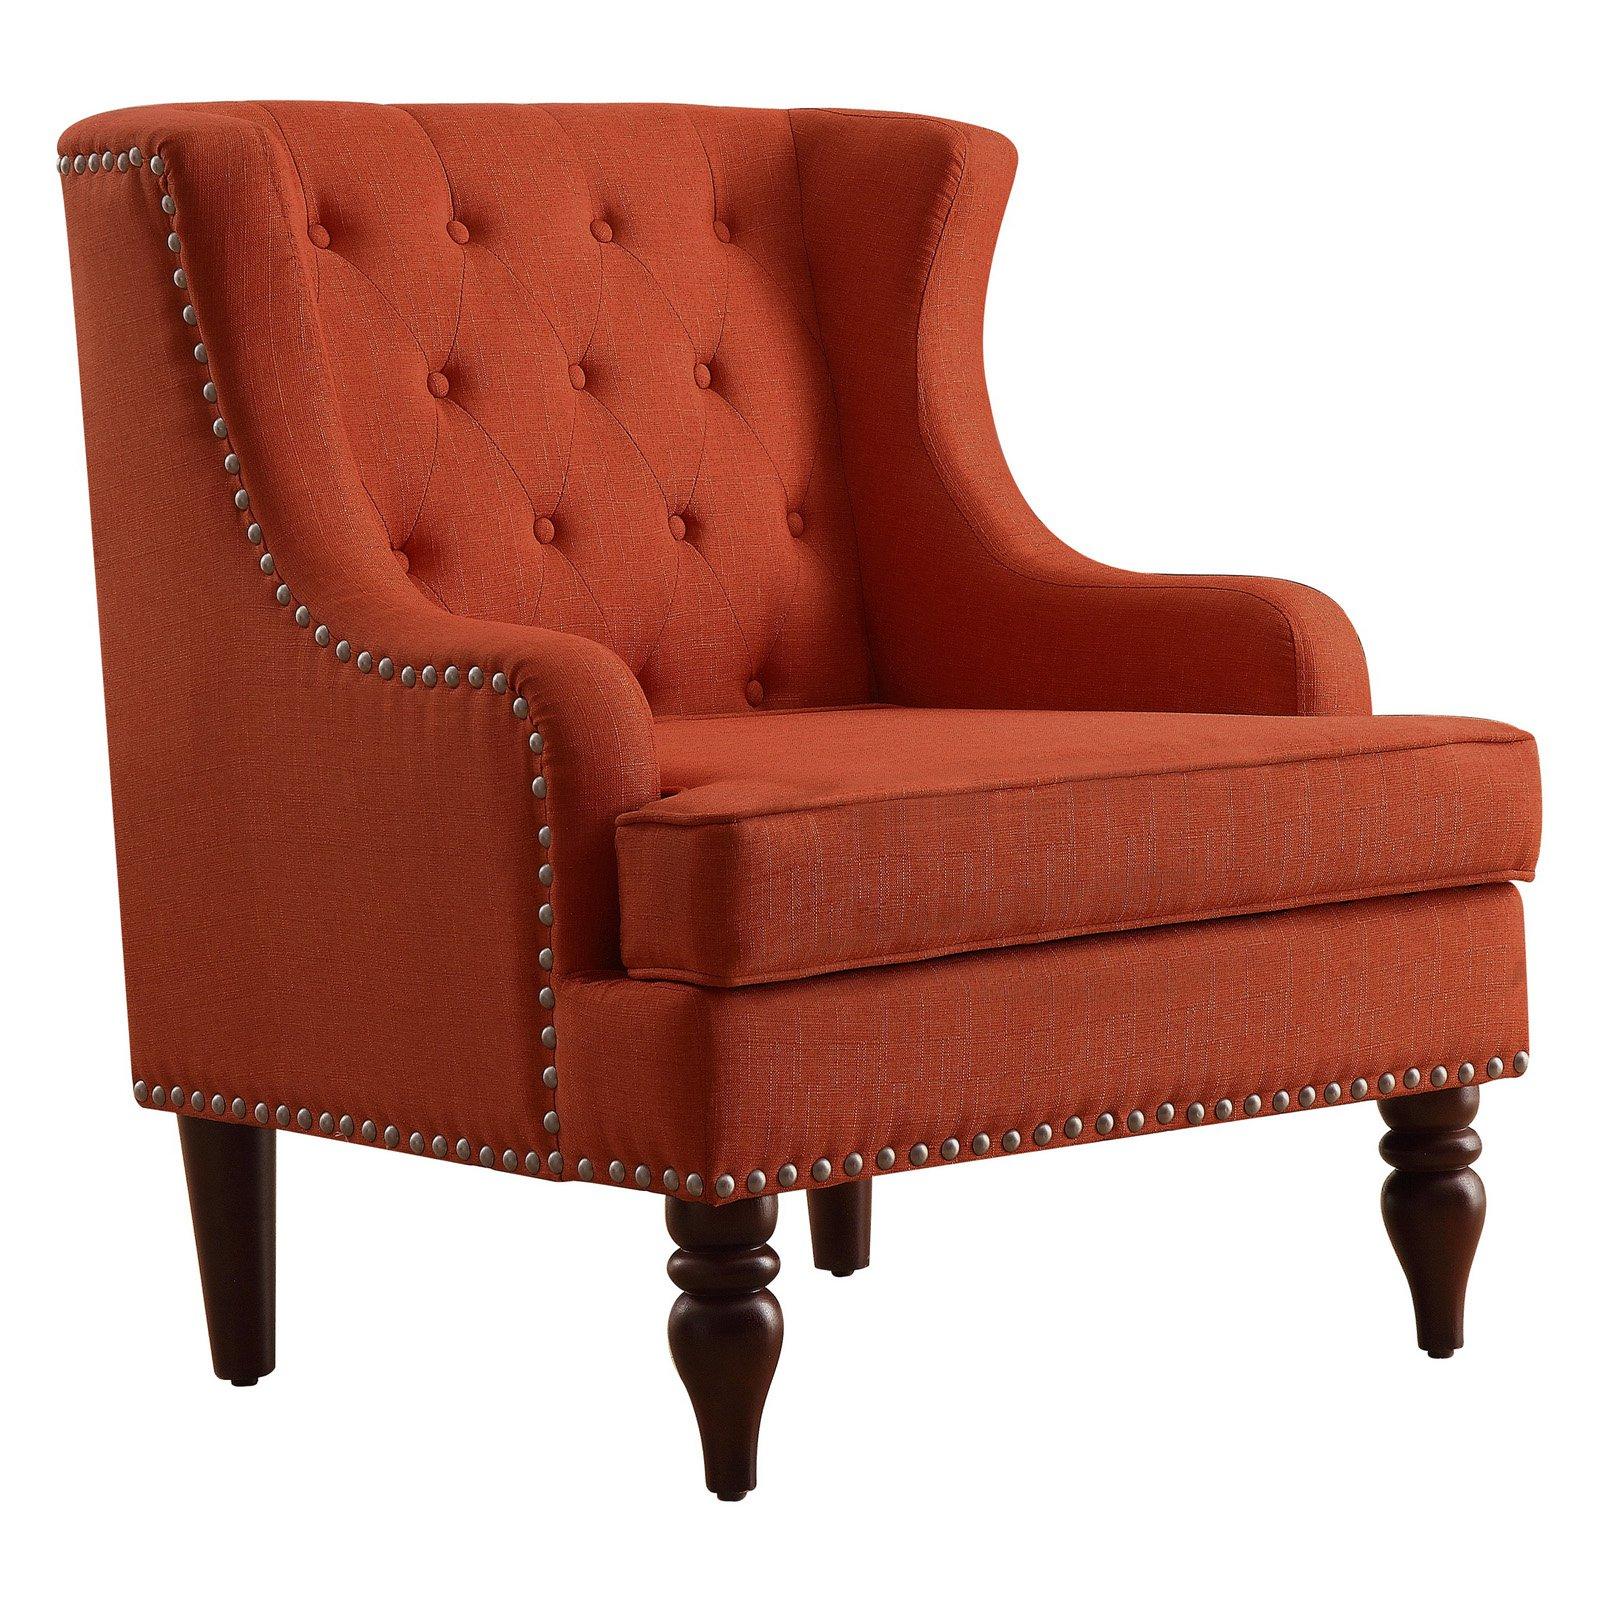 Rosevera Carafa Tufted Wingback Armchair - Walmart.com